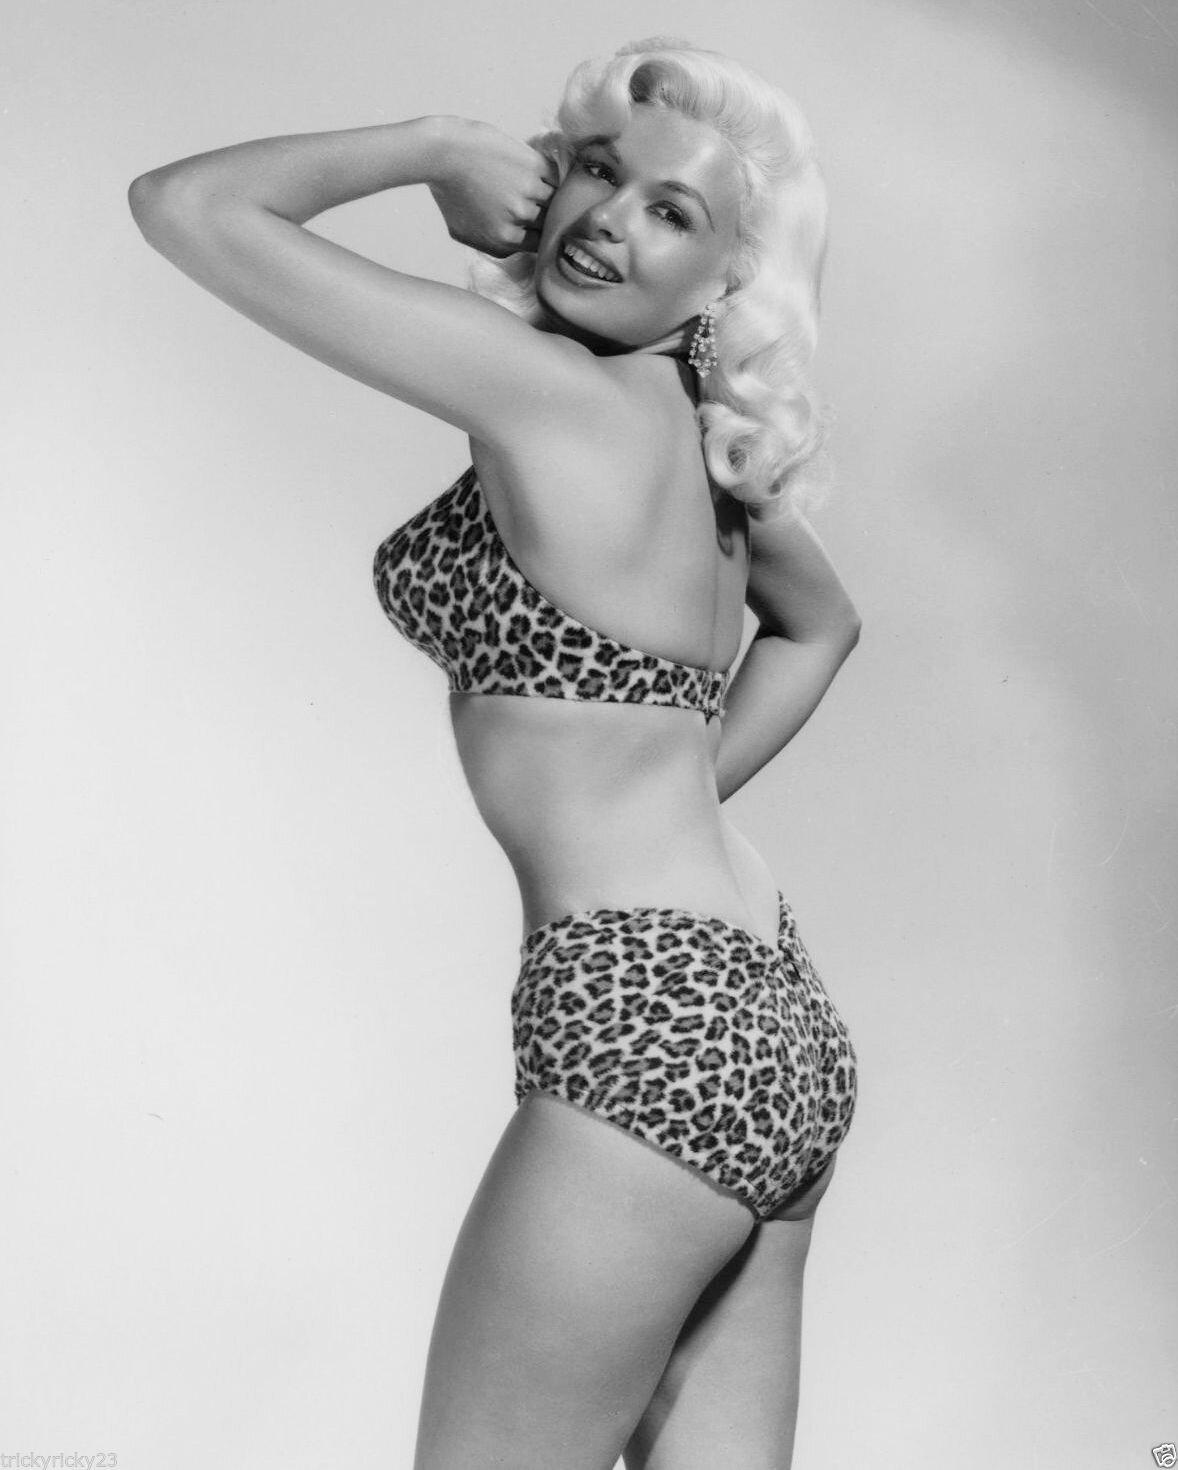 jayne_bikini_leopard-1958-by_keith_bernard-1-1